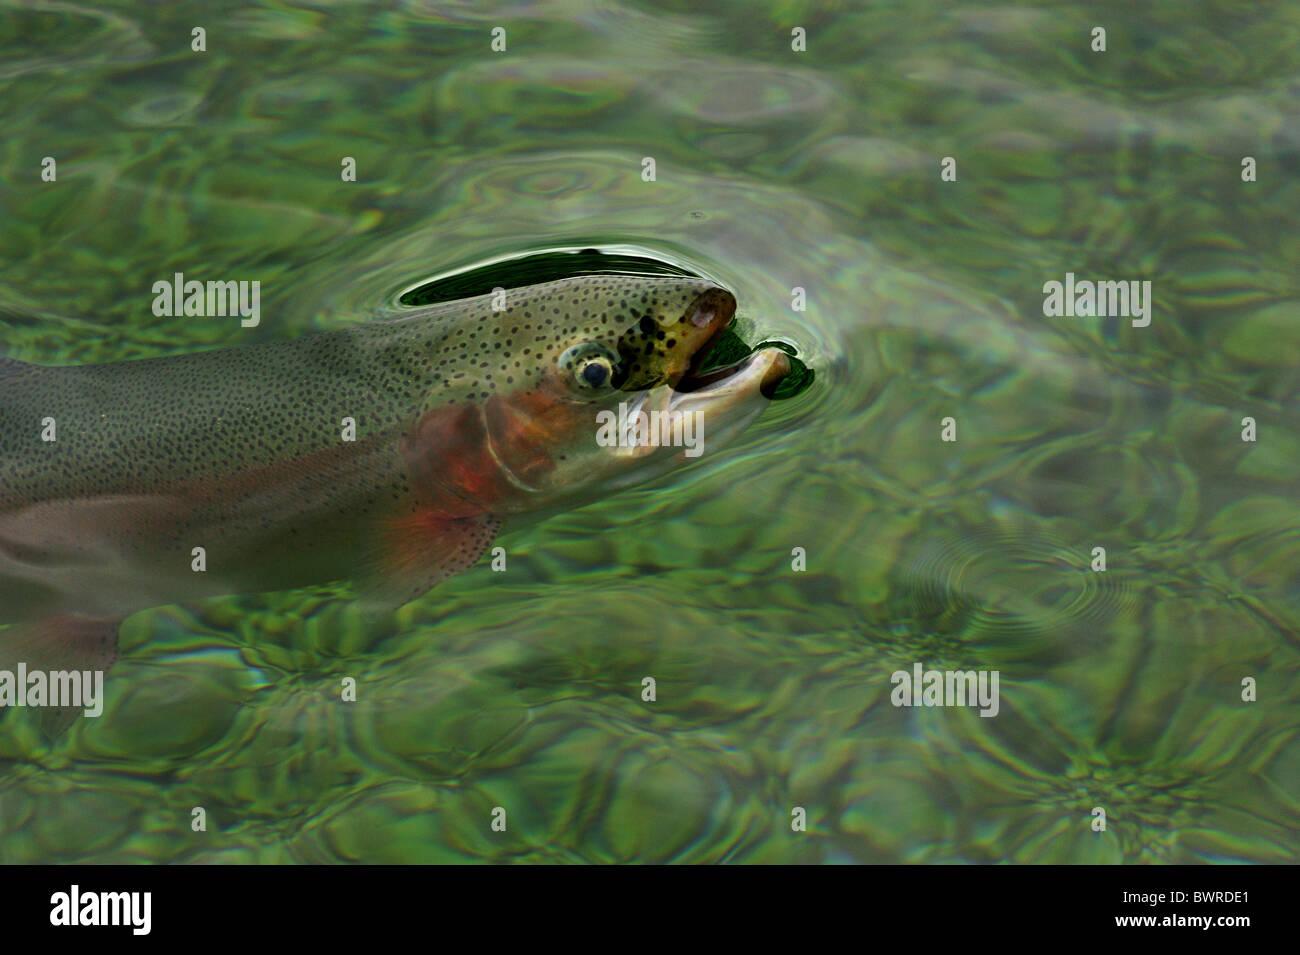 La trucha arco iris, Oncorhynchus mykiss, cautiva Imagen De Stock